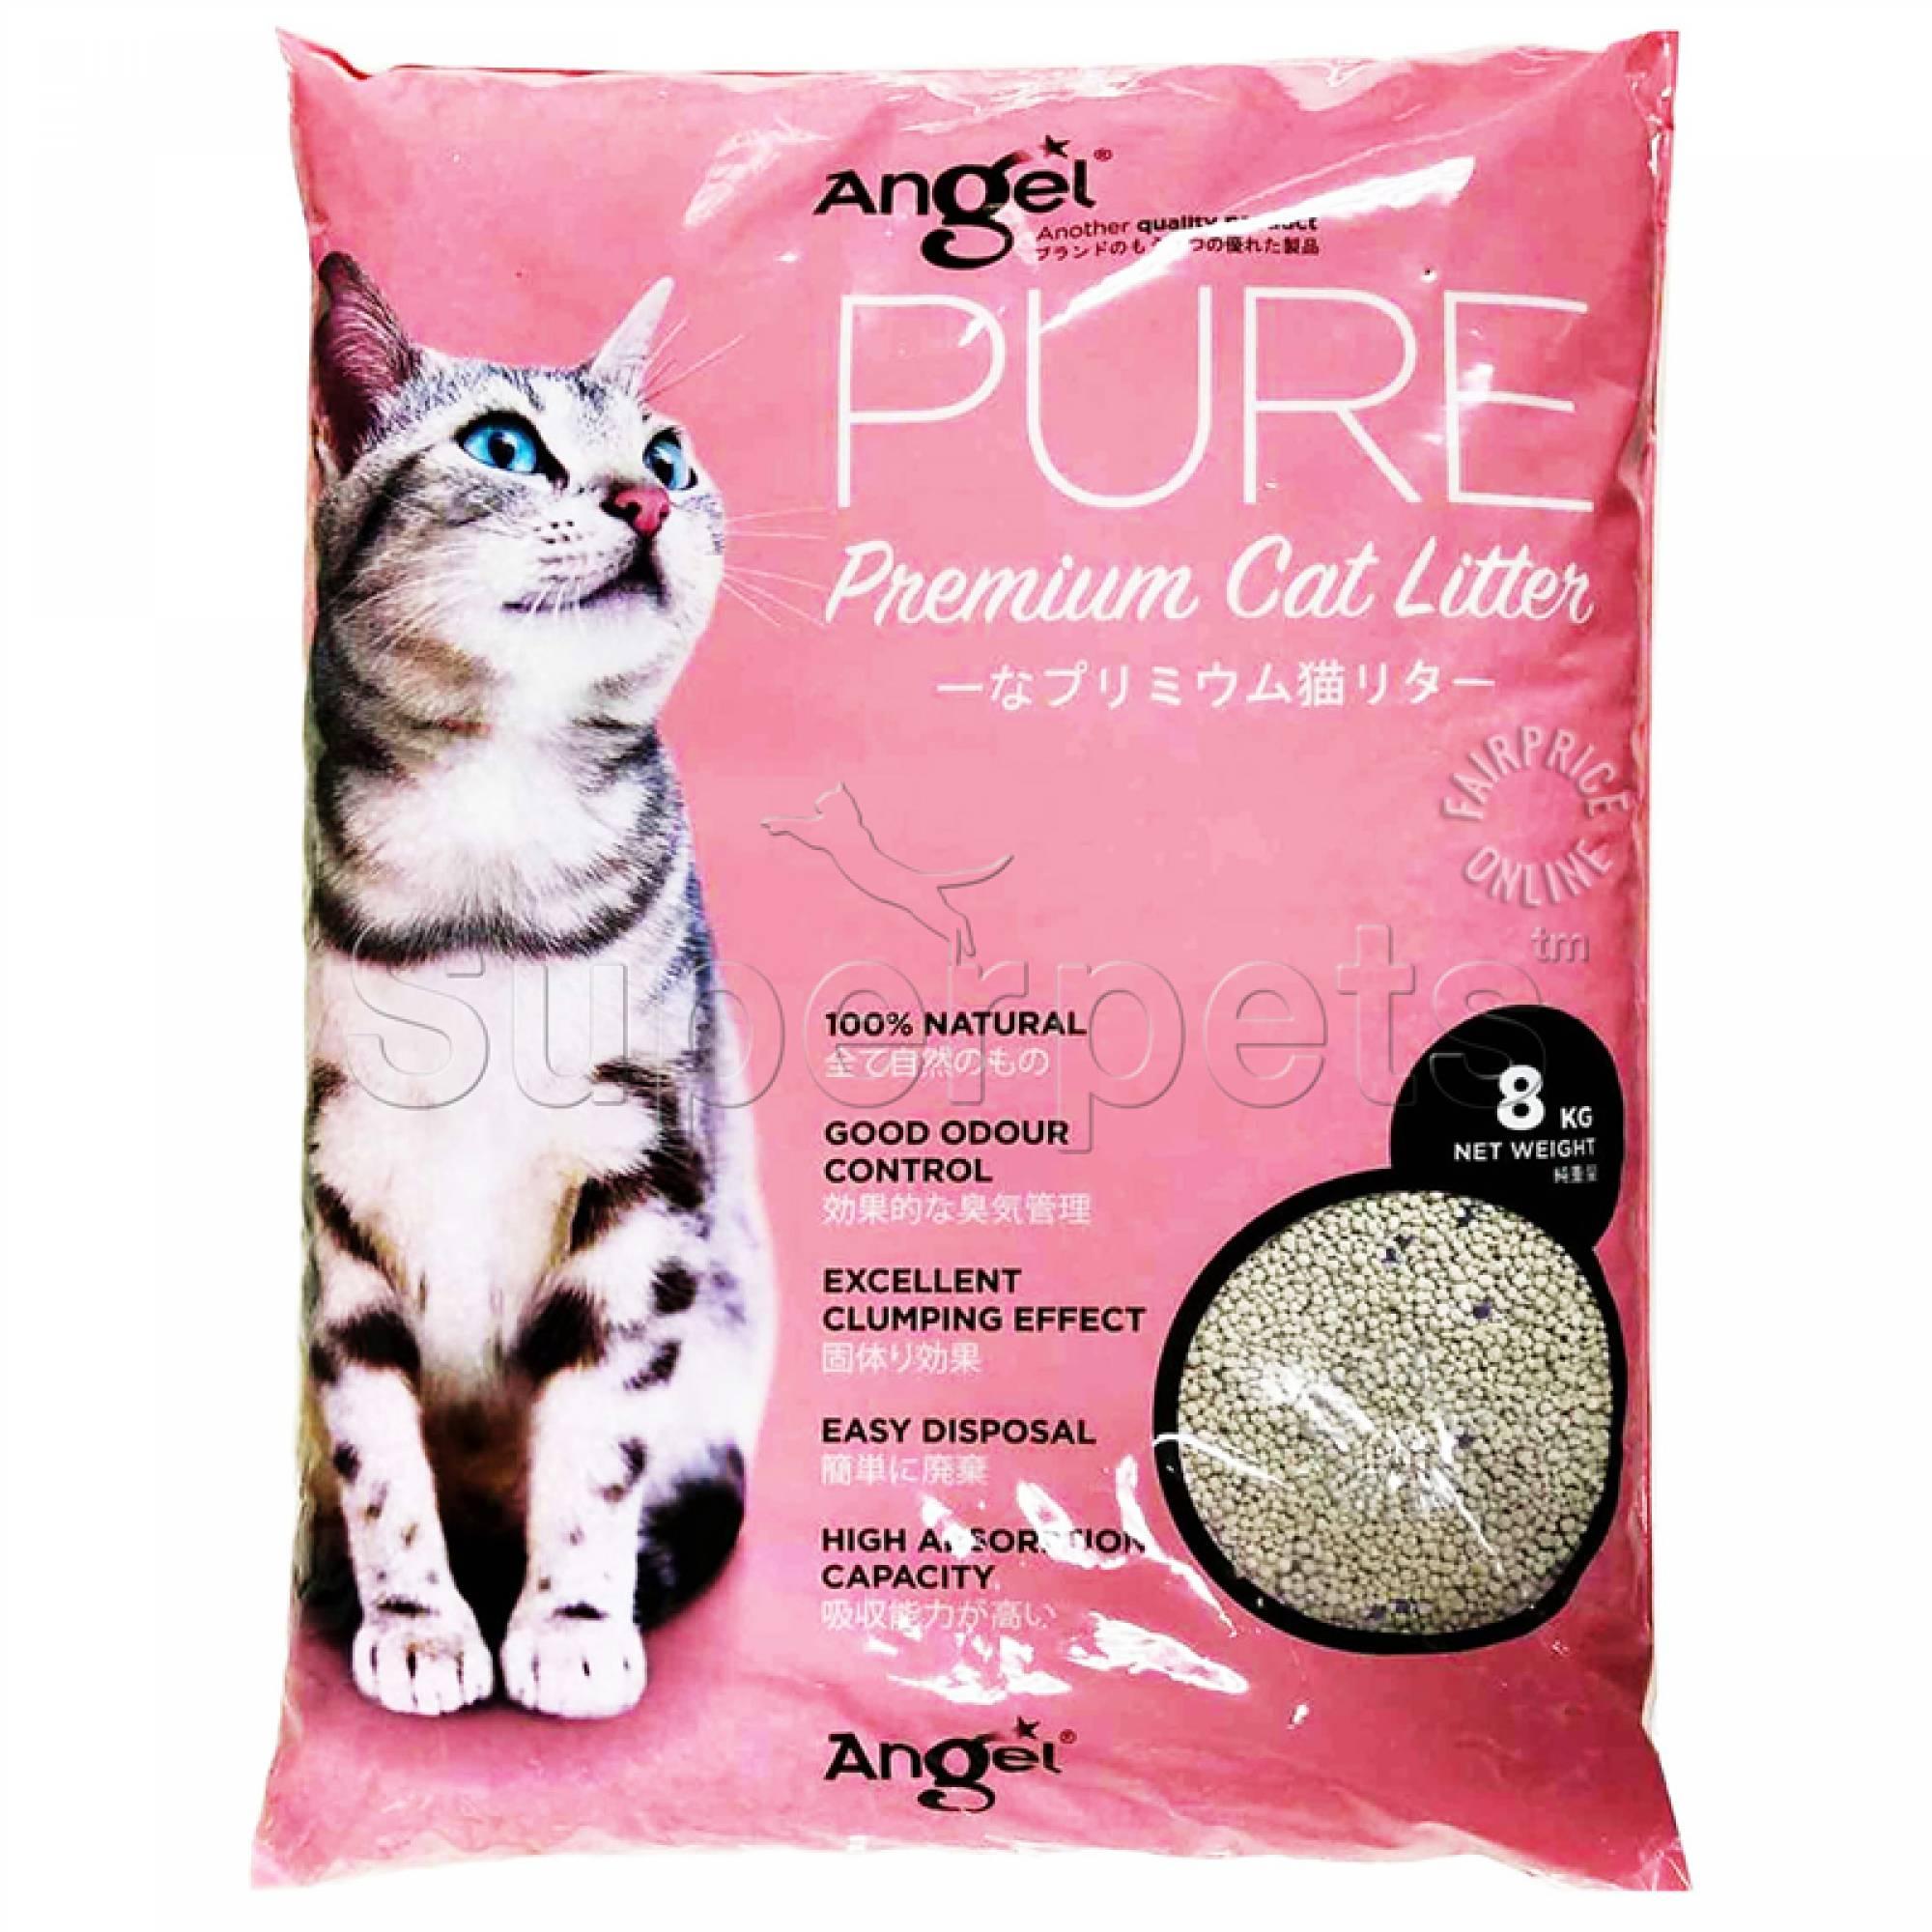 Angel - Pure Premium Cat Litter 8kg